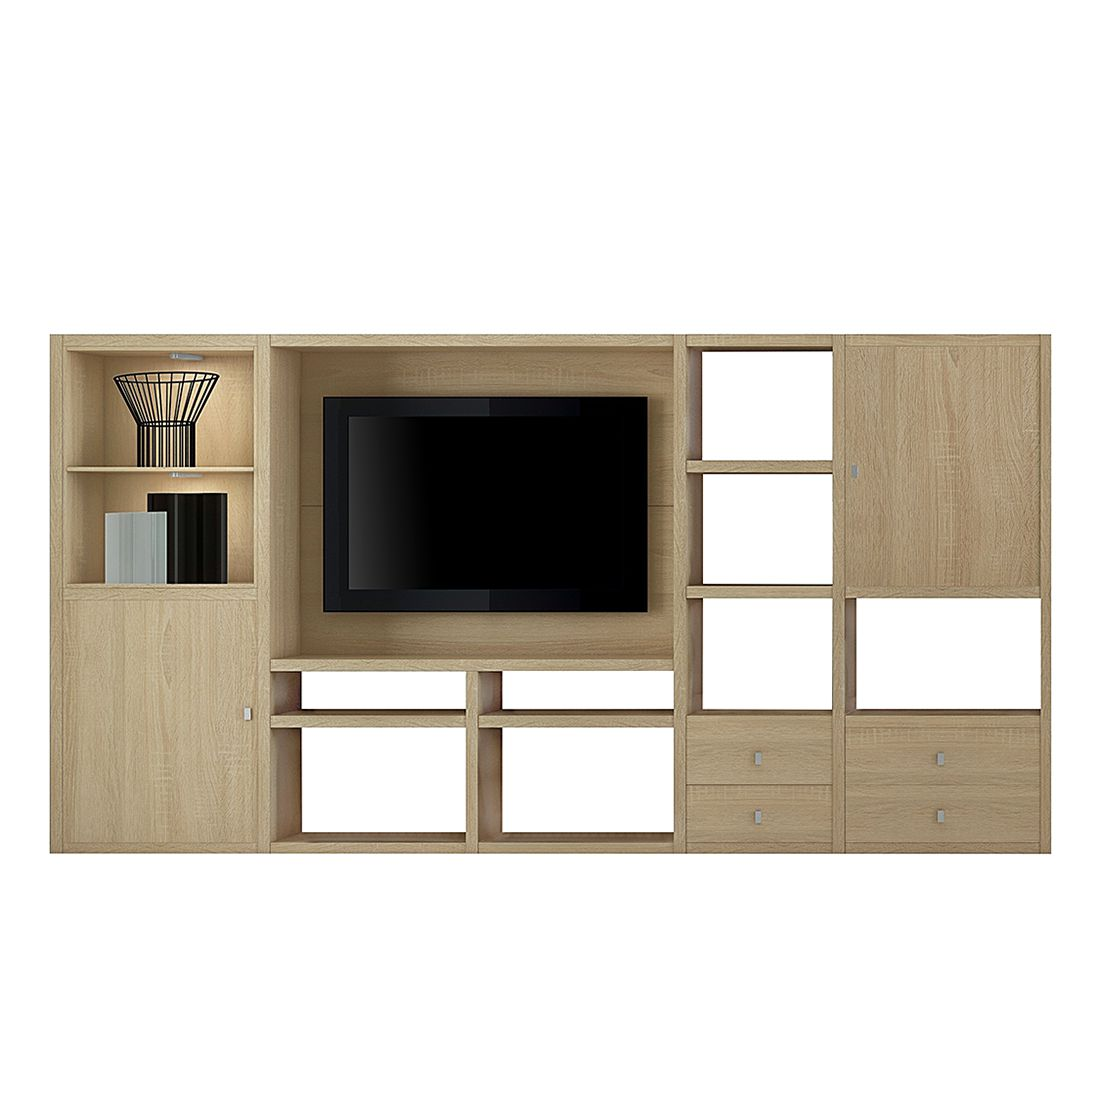 energie  A+, Tv-wand Emporior I - inclusief verlichting - Eikenhouten look, Fredriks